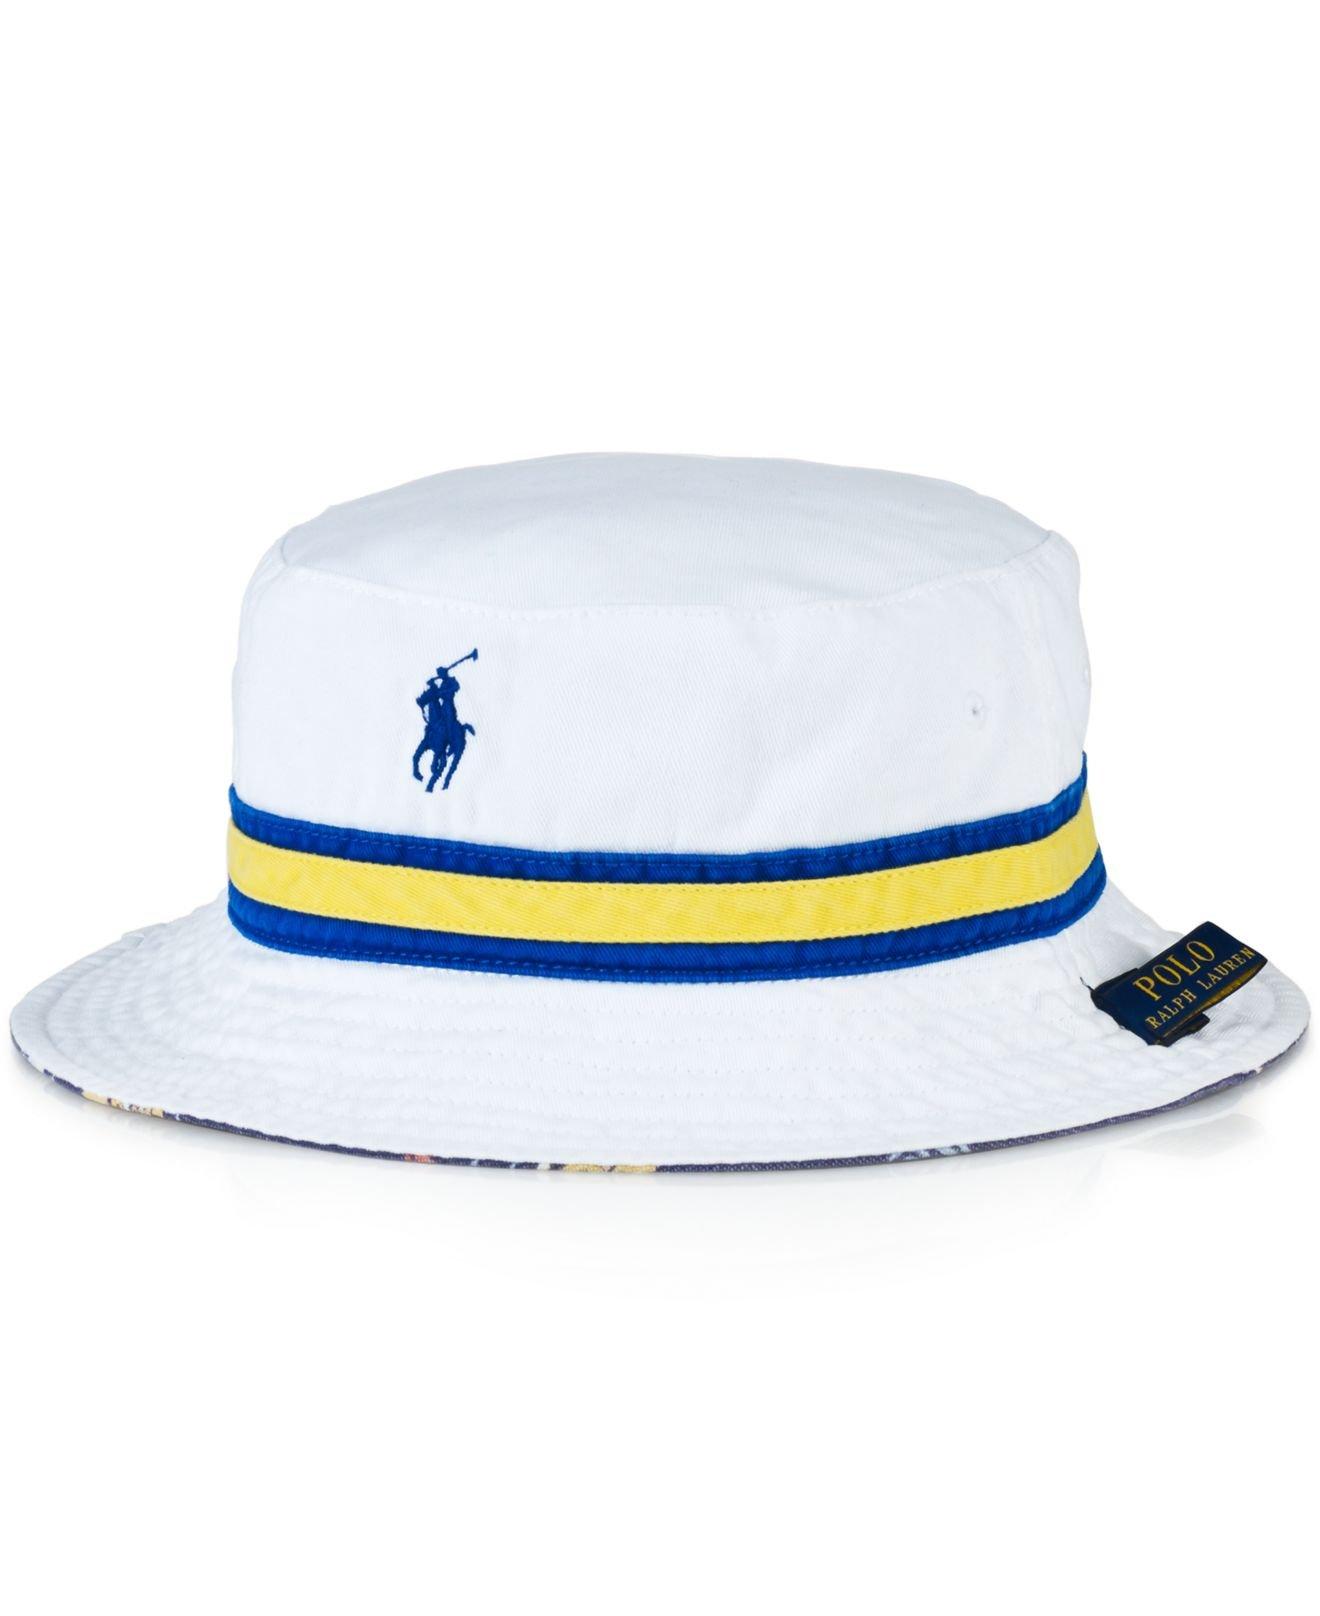 lyst polo ralph lauren reversible bucket hat in white